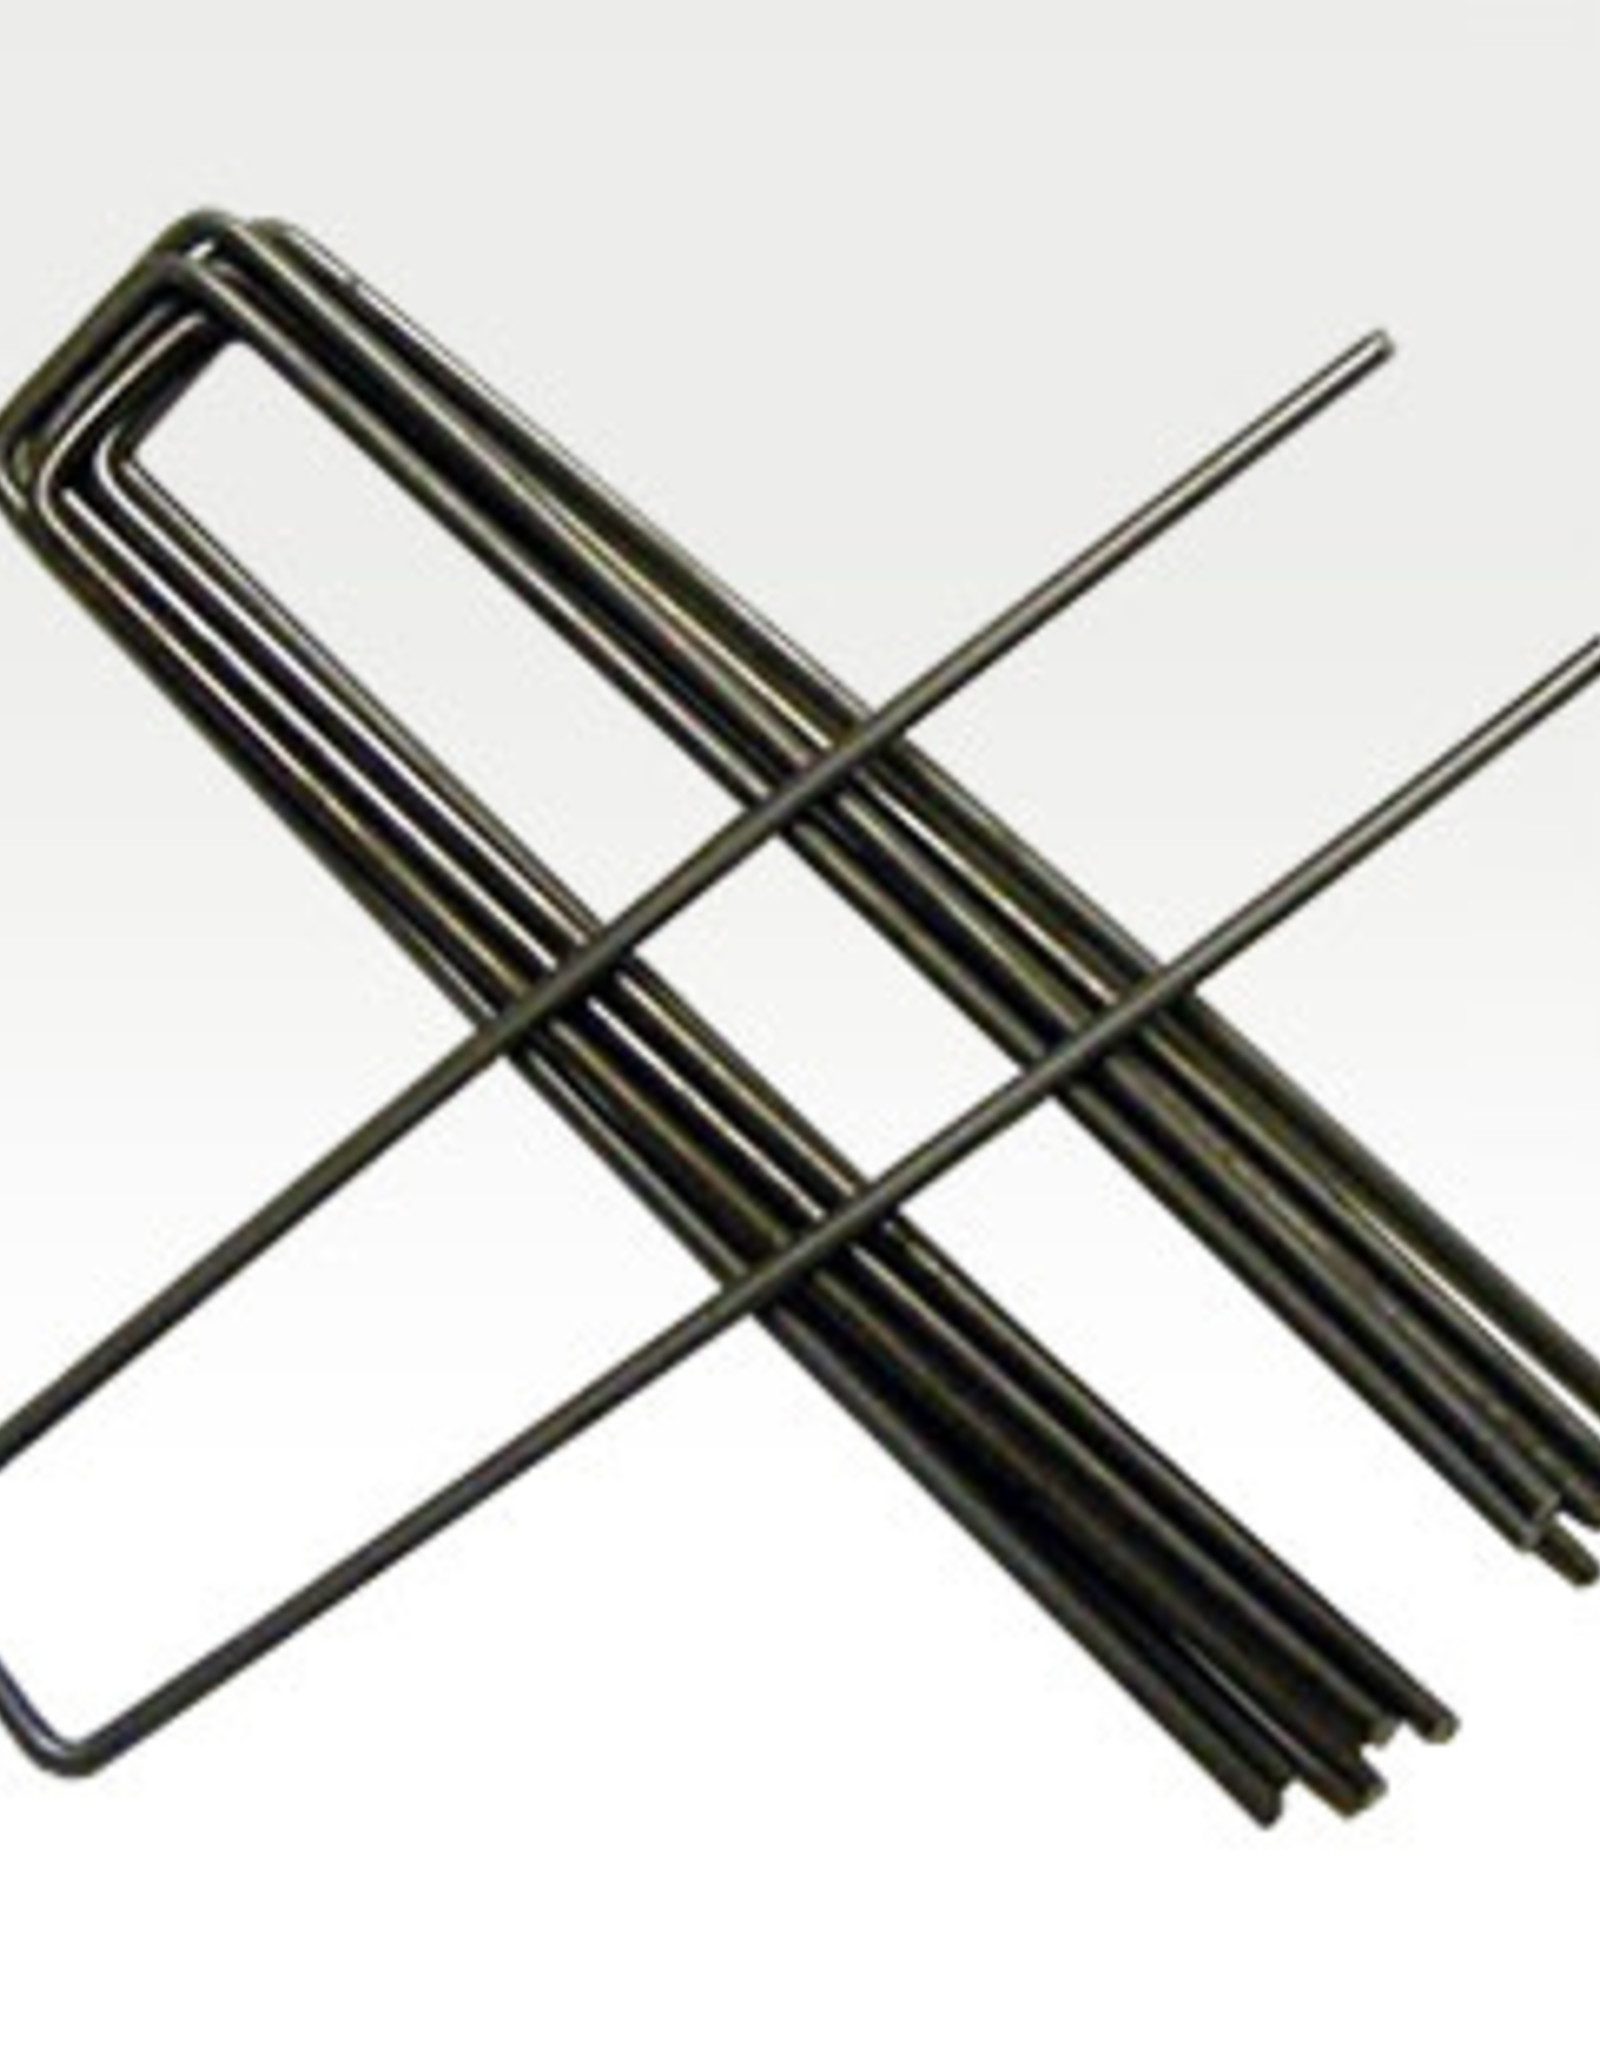 Sod Staples 8 inch - 300 Per Box